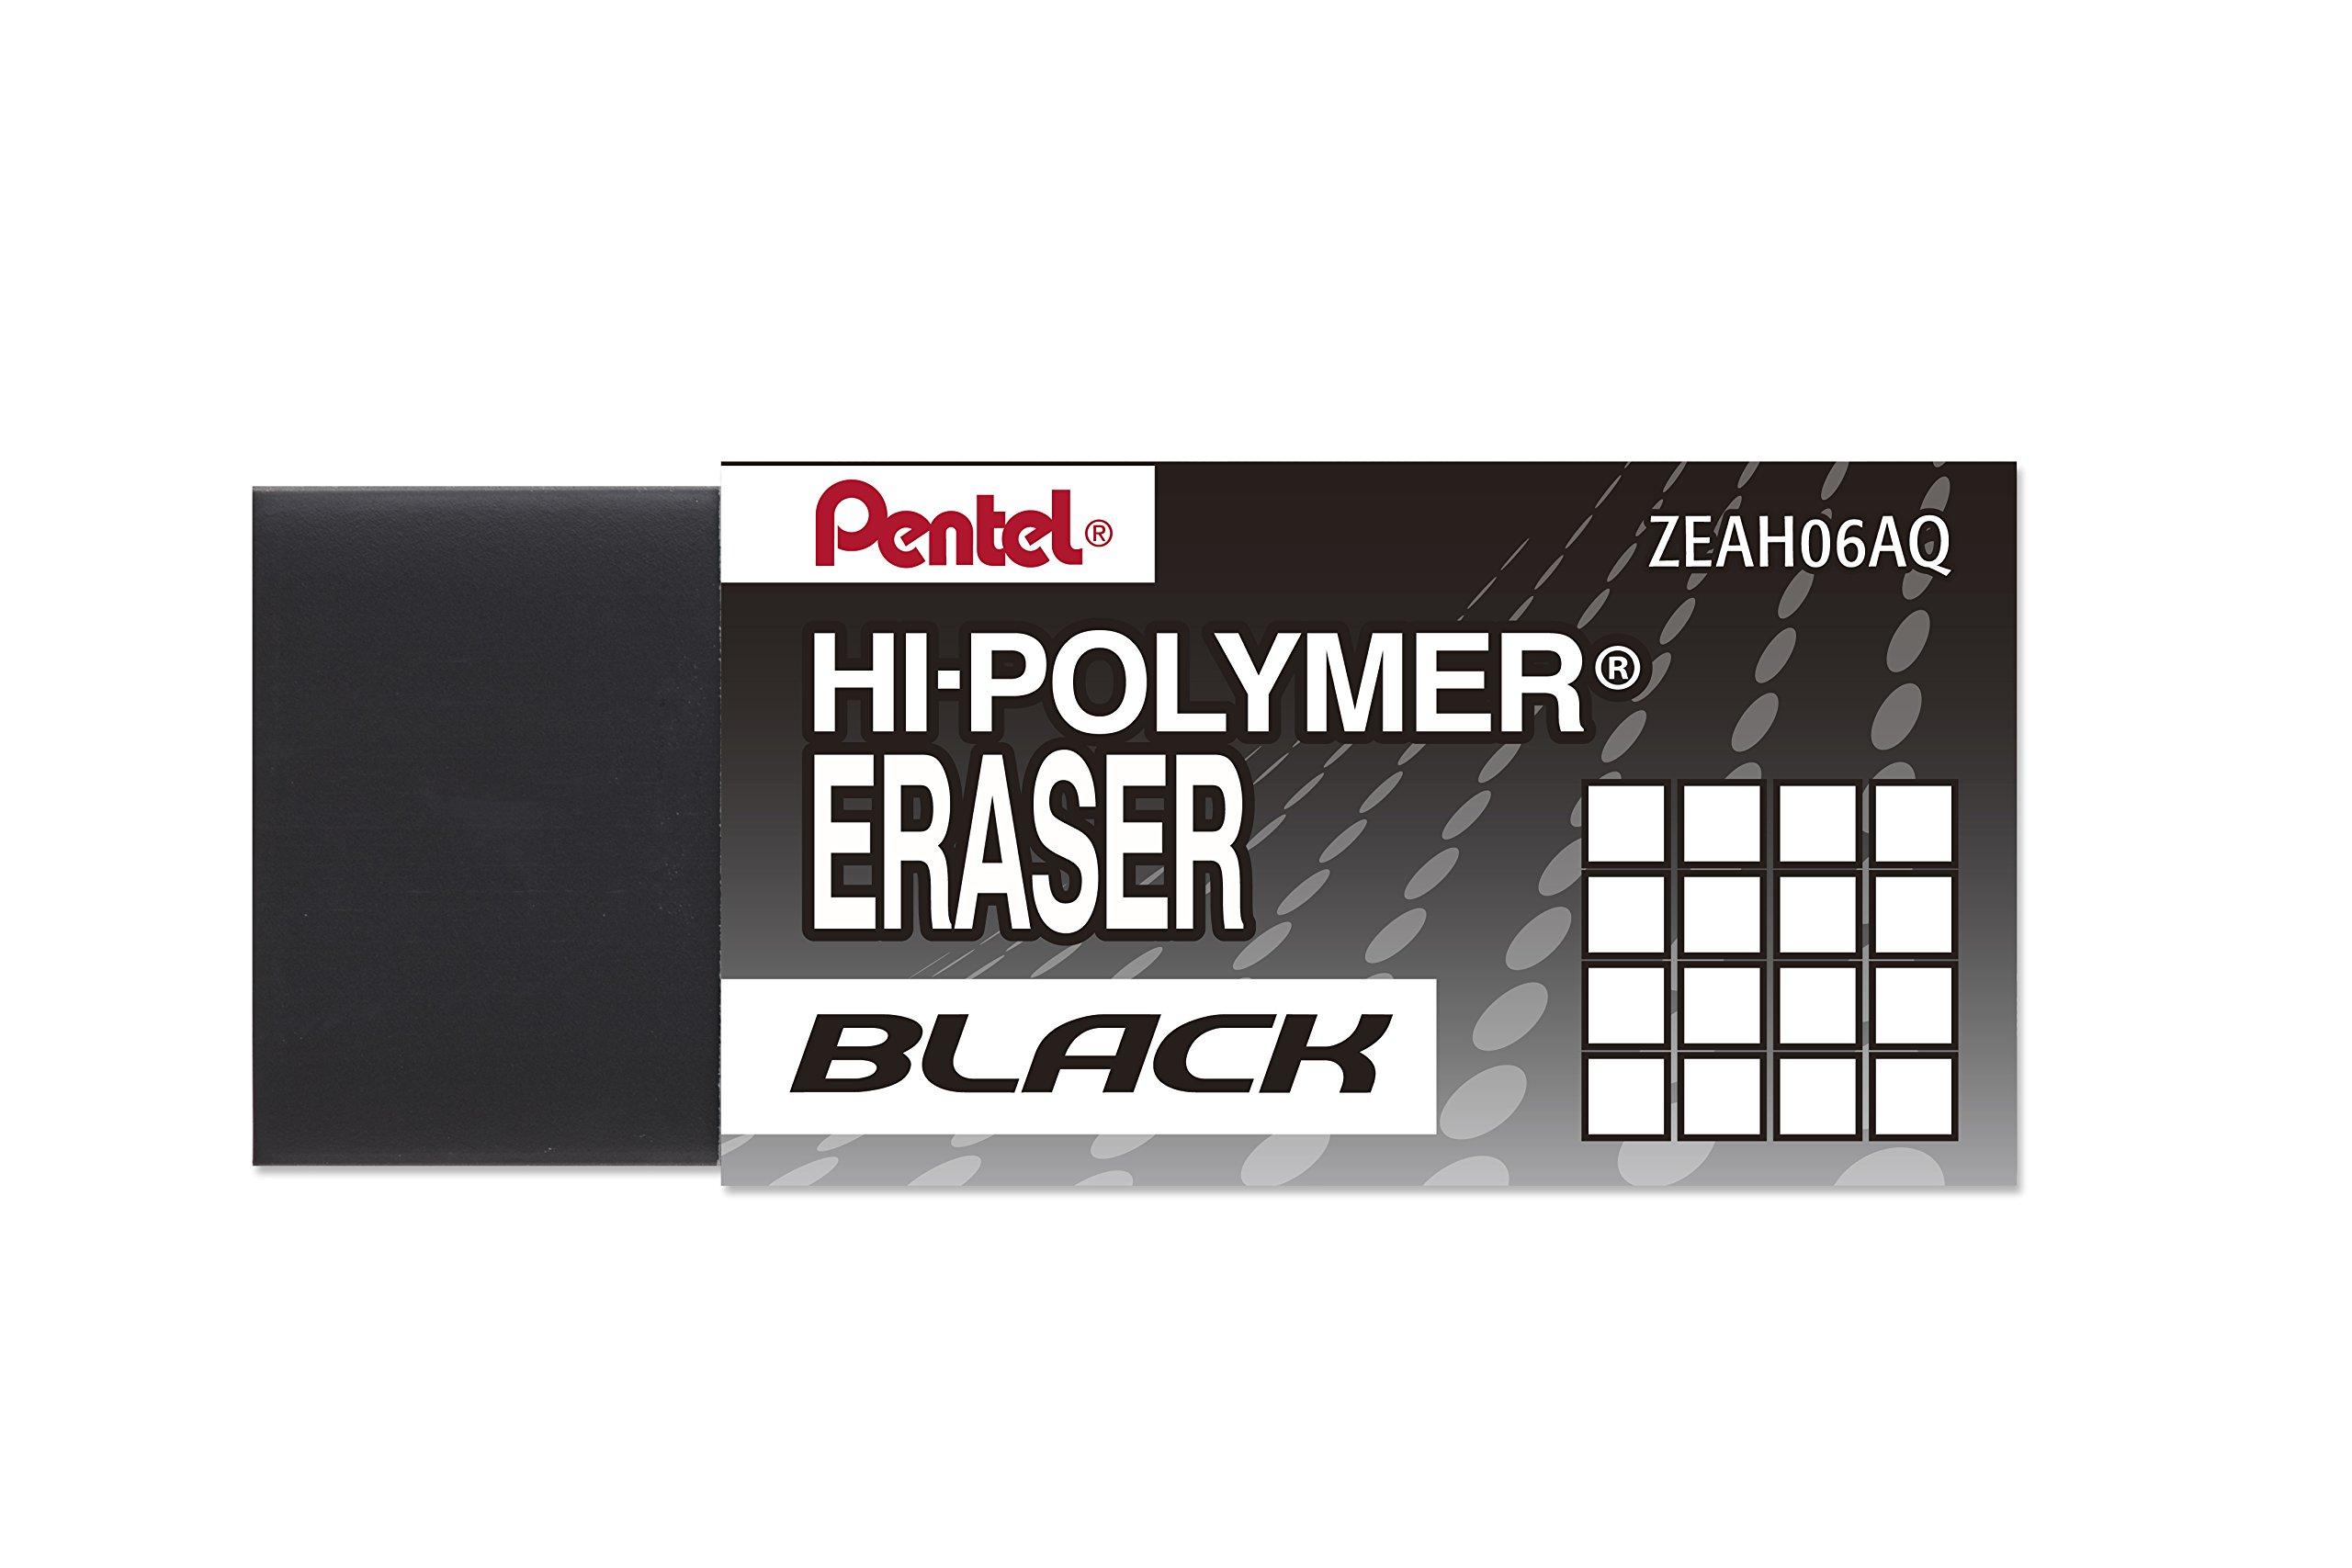 Pentel Hi-Polymer Block Eraser, Small Black 48 pack (ZEAH06A) by Pentel (Image #4)